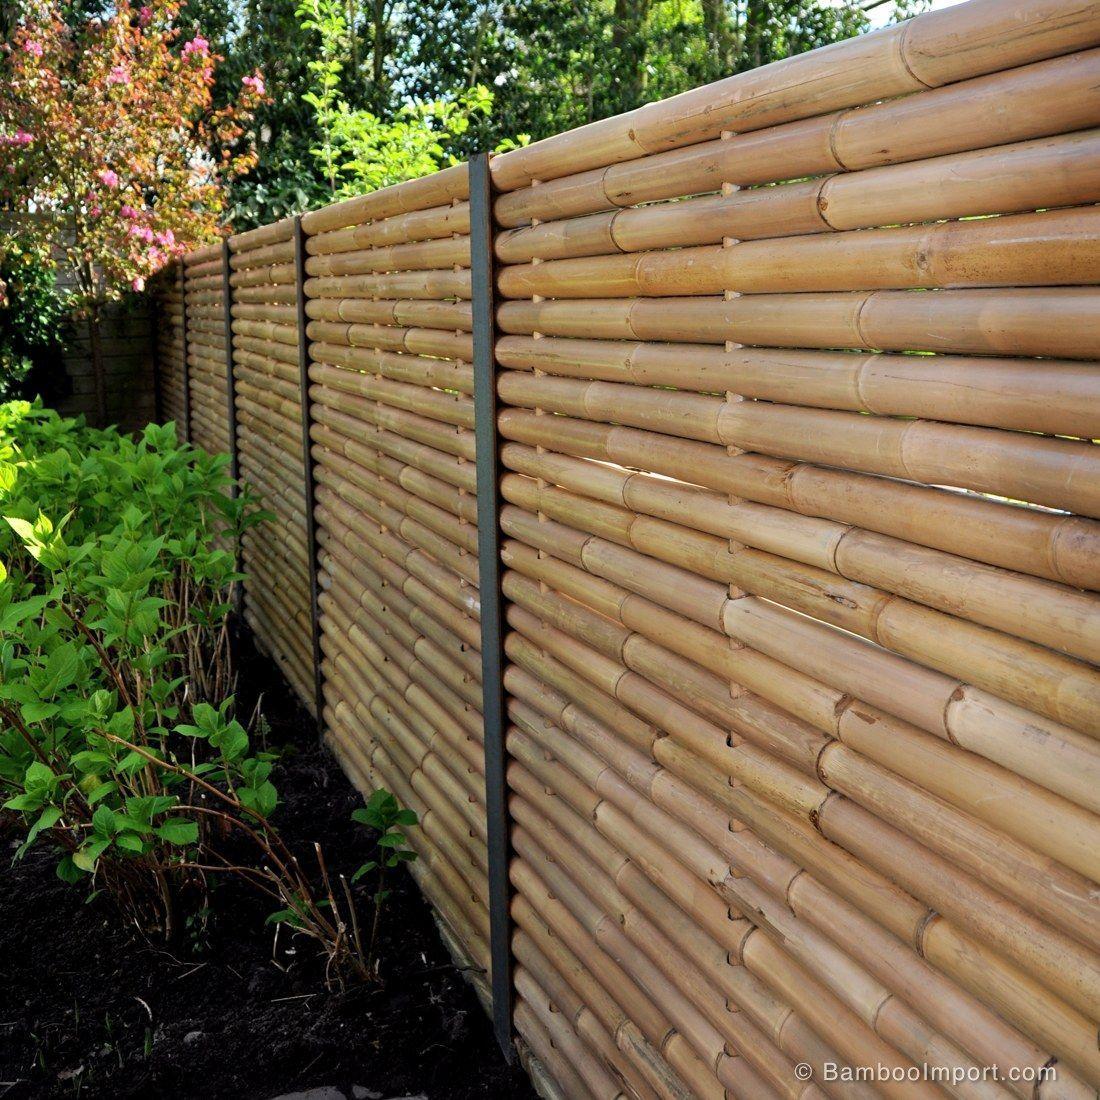 Giant Bamboo Fence Panel 180 X 180 Cm Bamboo Fence Fence Backyard Fence Desi Backyard In 2020 Bamboo Screening Fence Bamboo Garden Fences Privacy Fence Designs